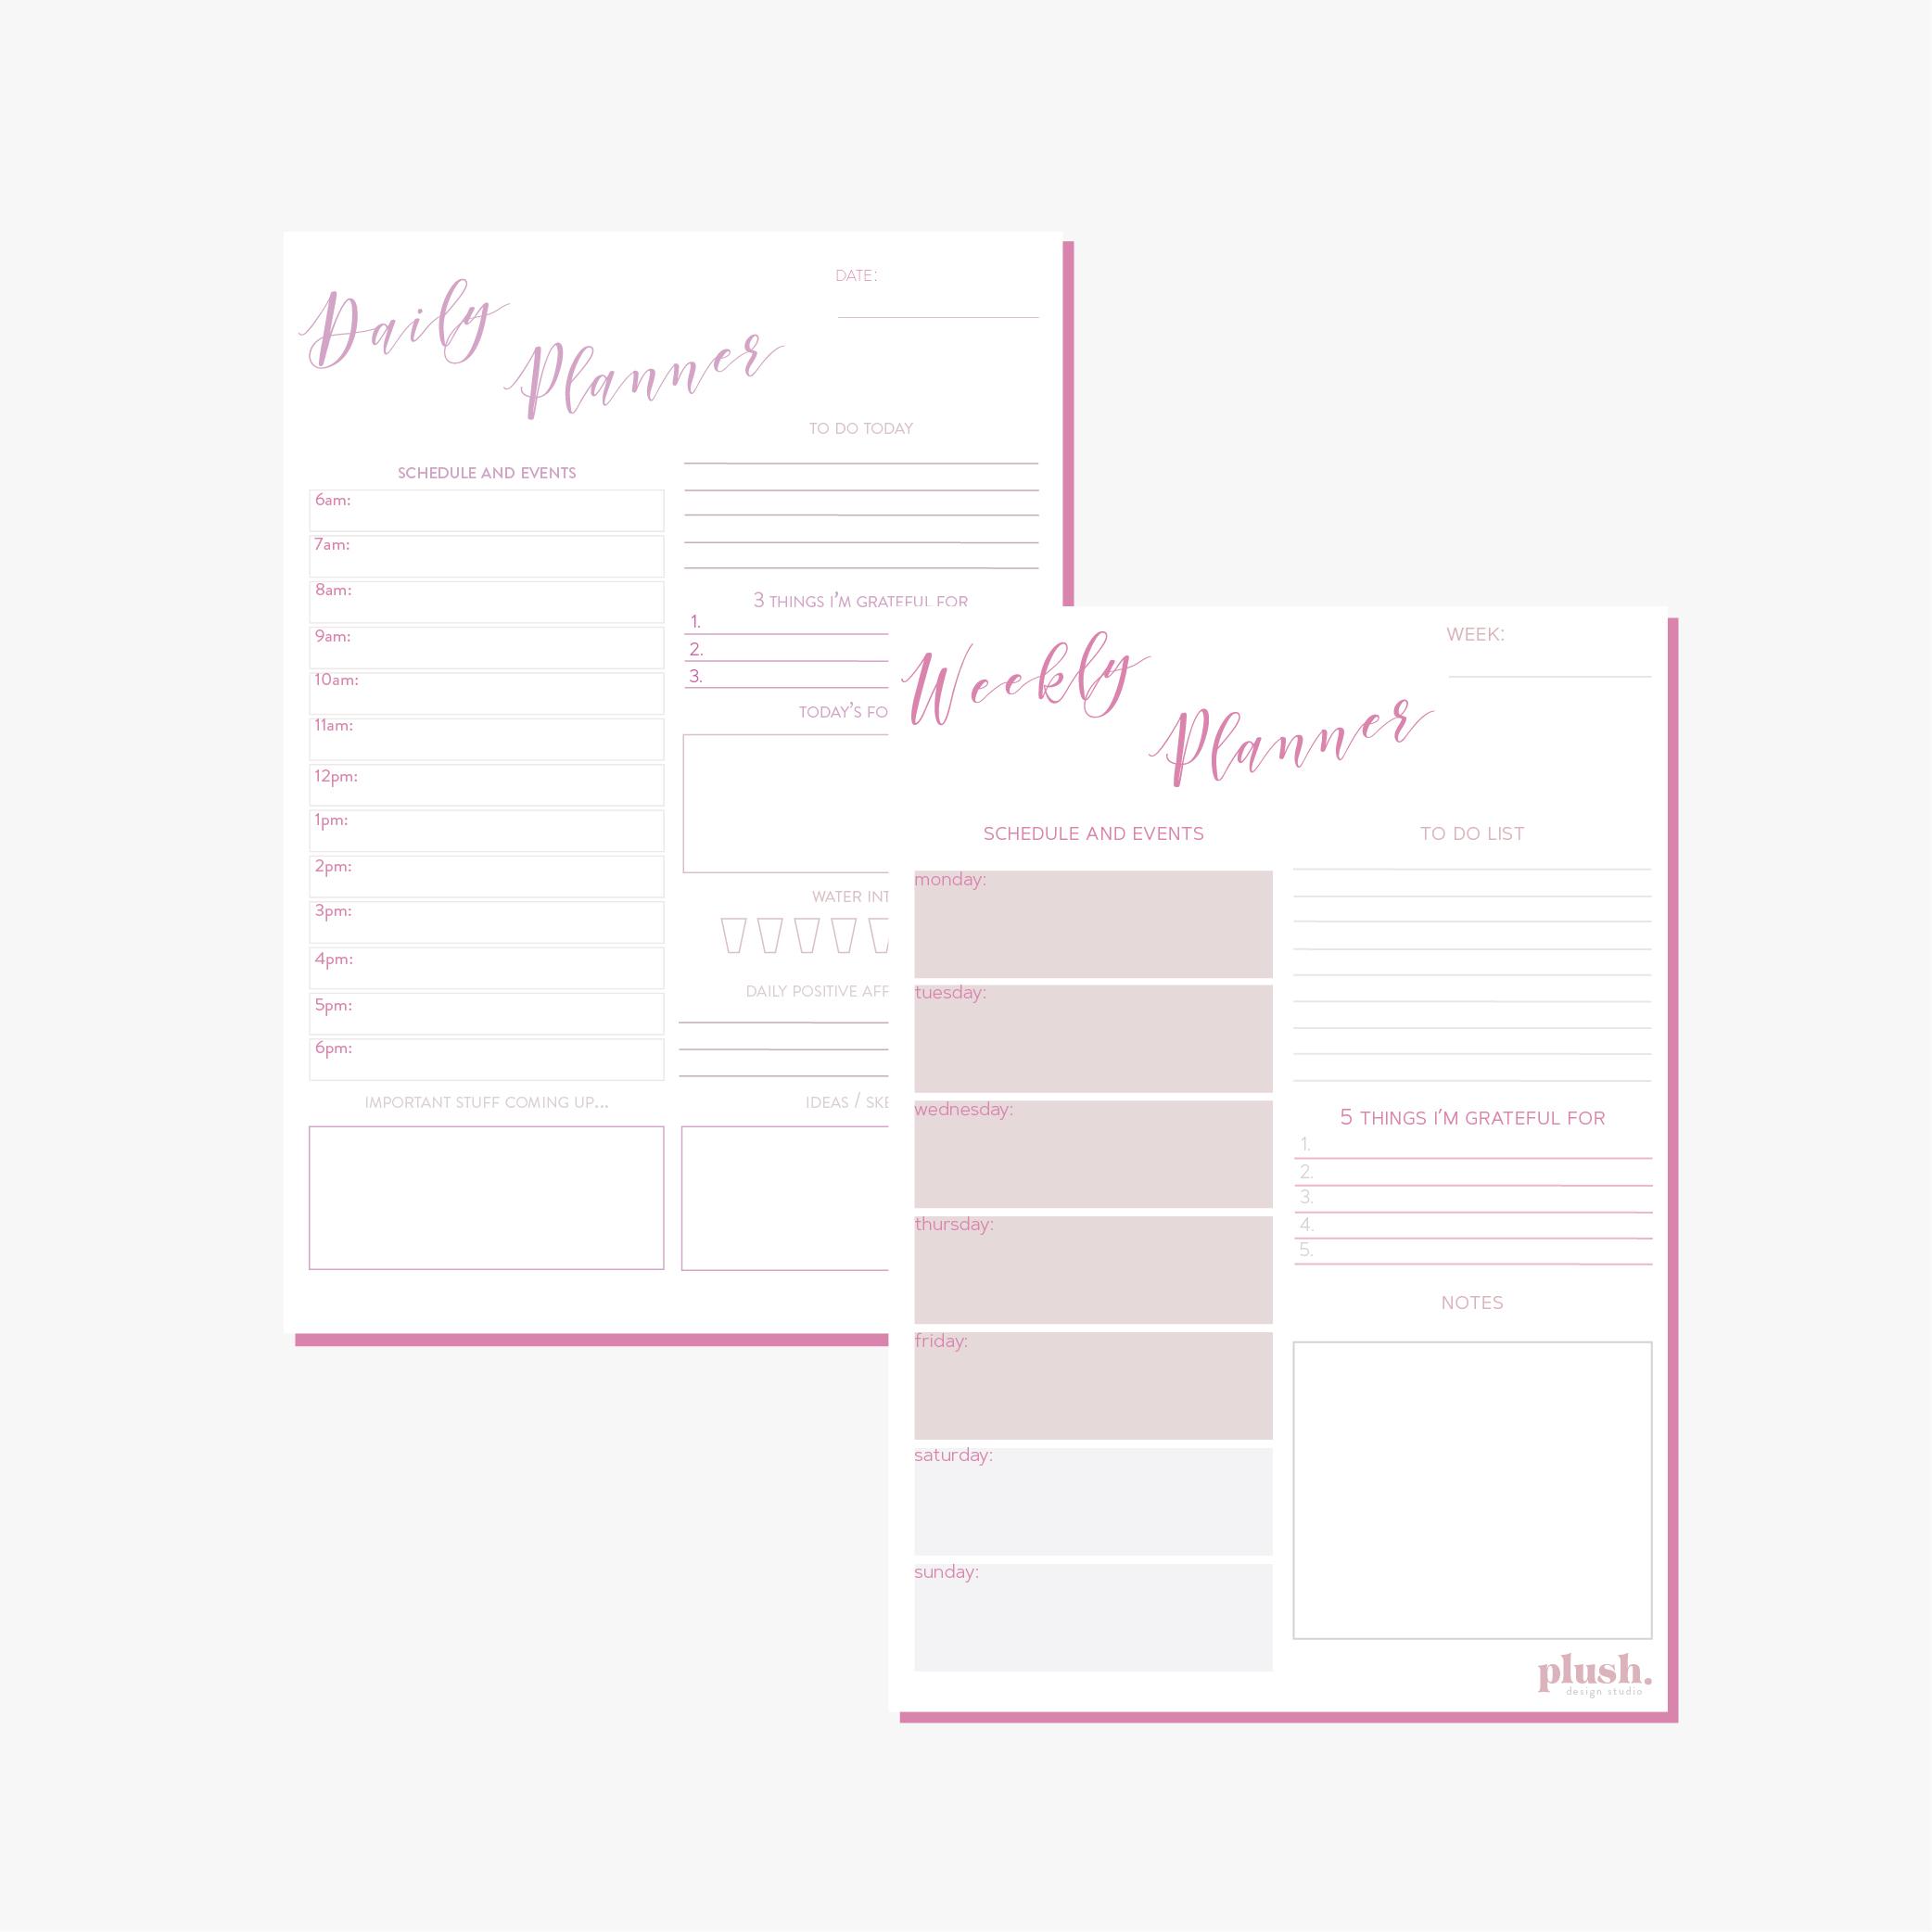 Printable PDF Planner by Plush Design Studio Coffs Harbour.jpg